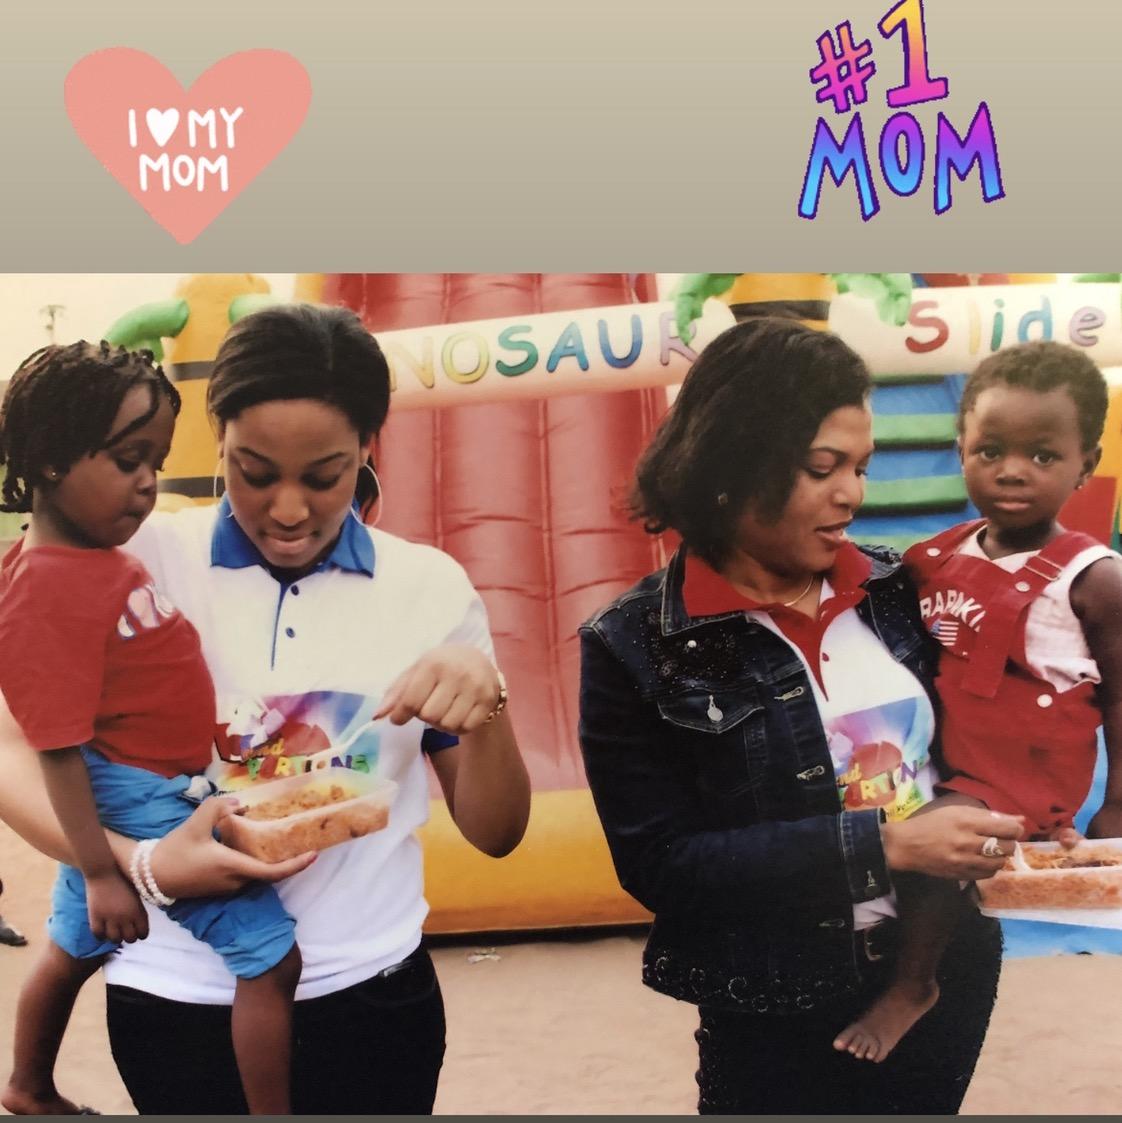 Happy Mother's Day mummy ❤️❤️❤️❤️❤️❤️❤️❤️❤️❤️❤️